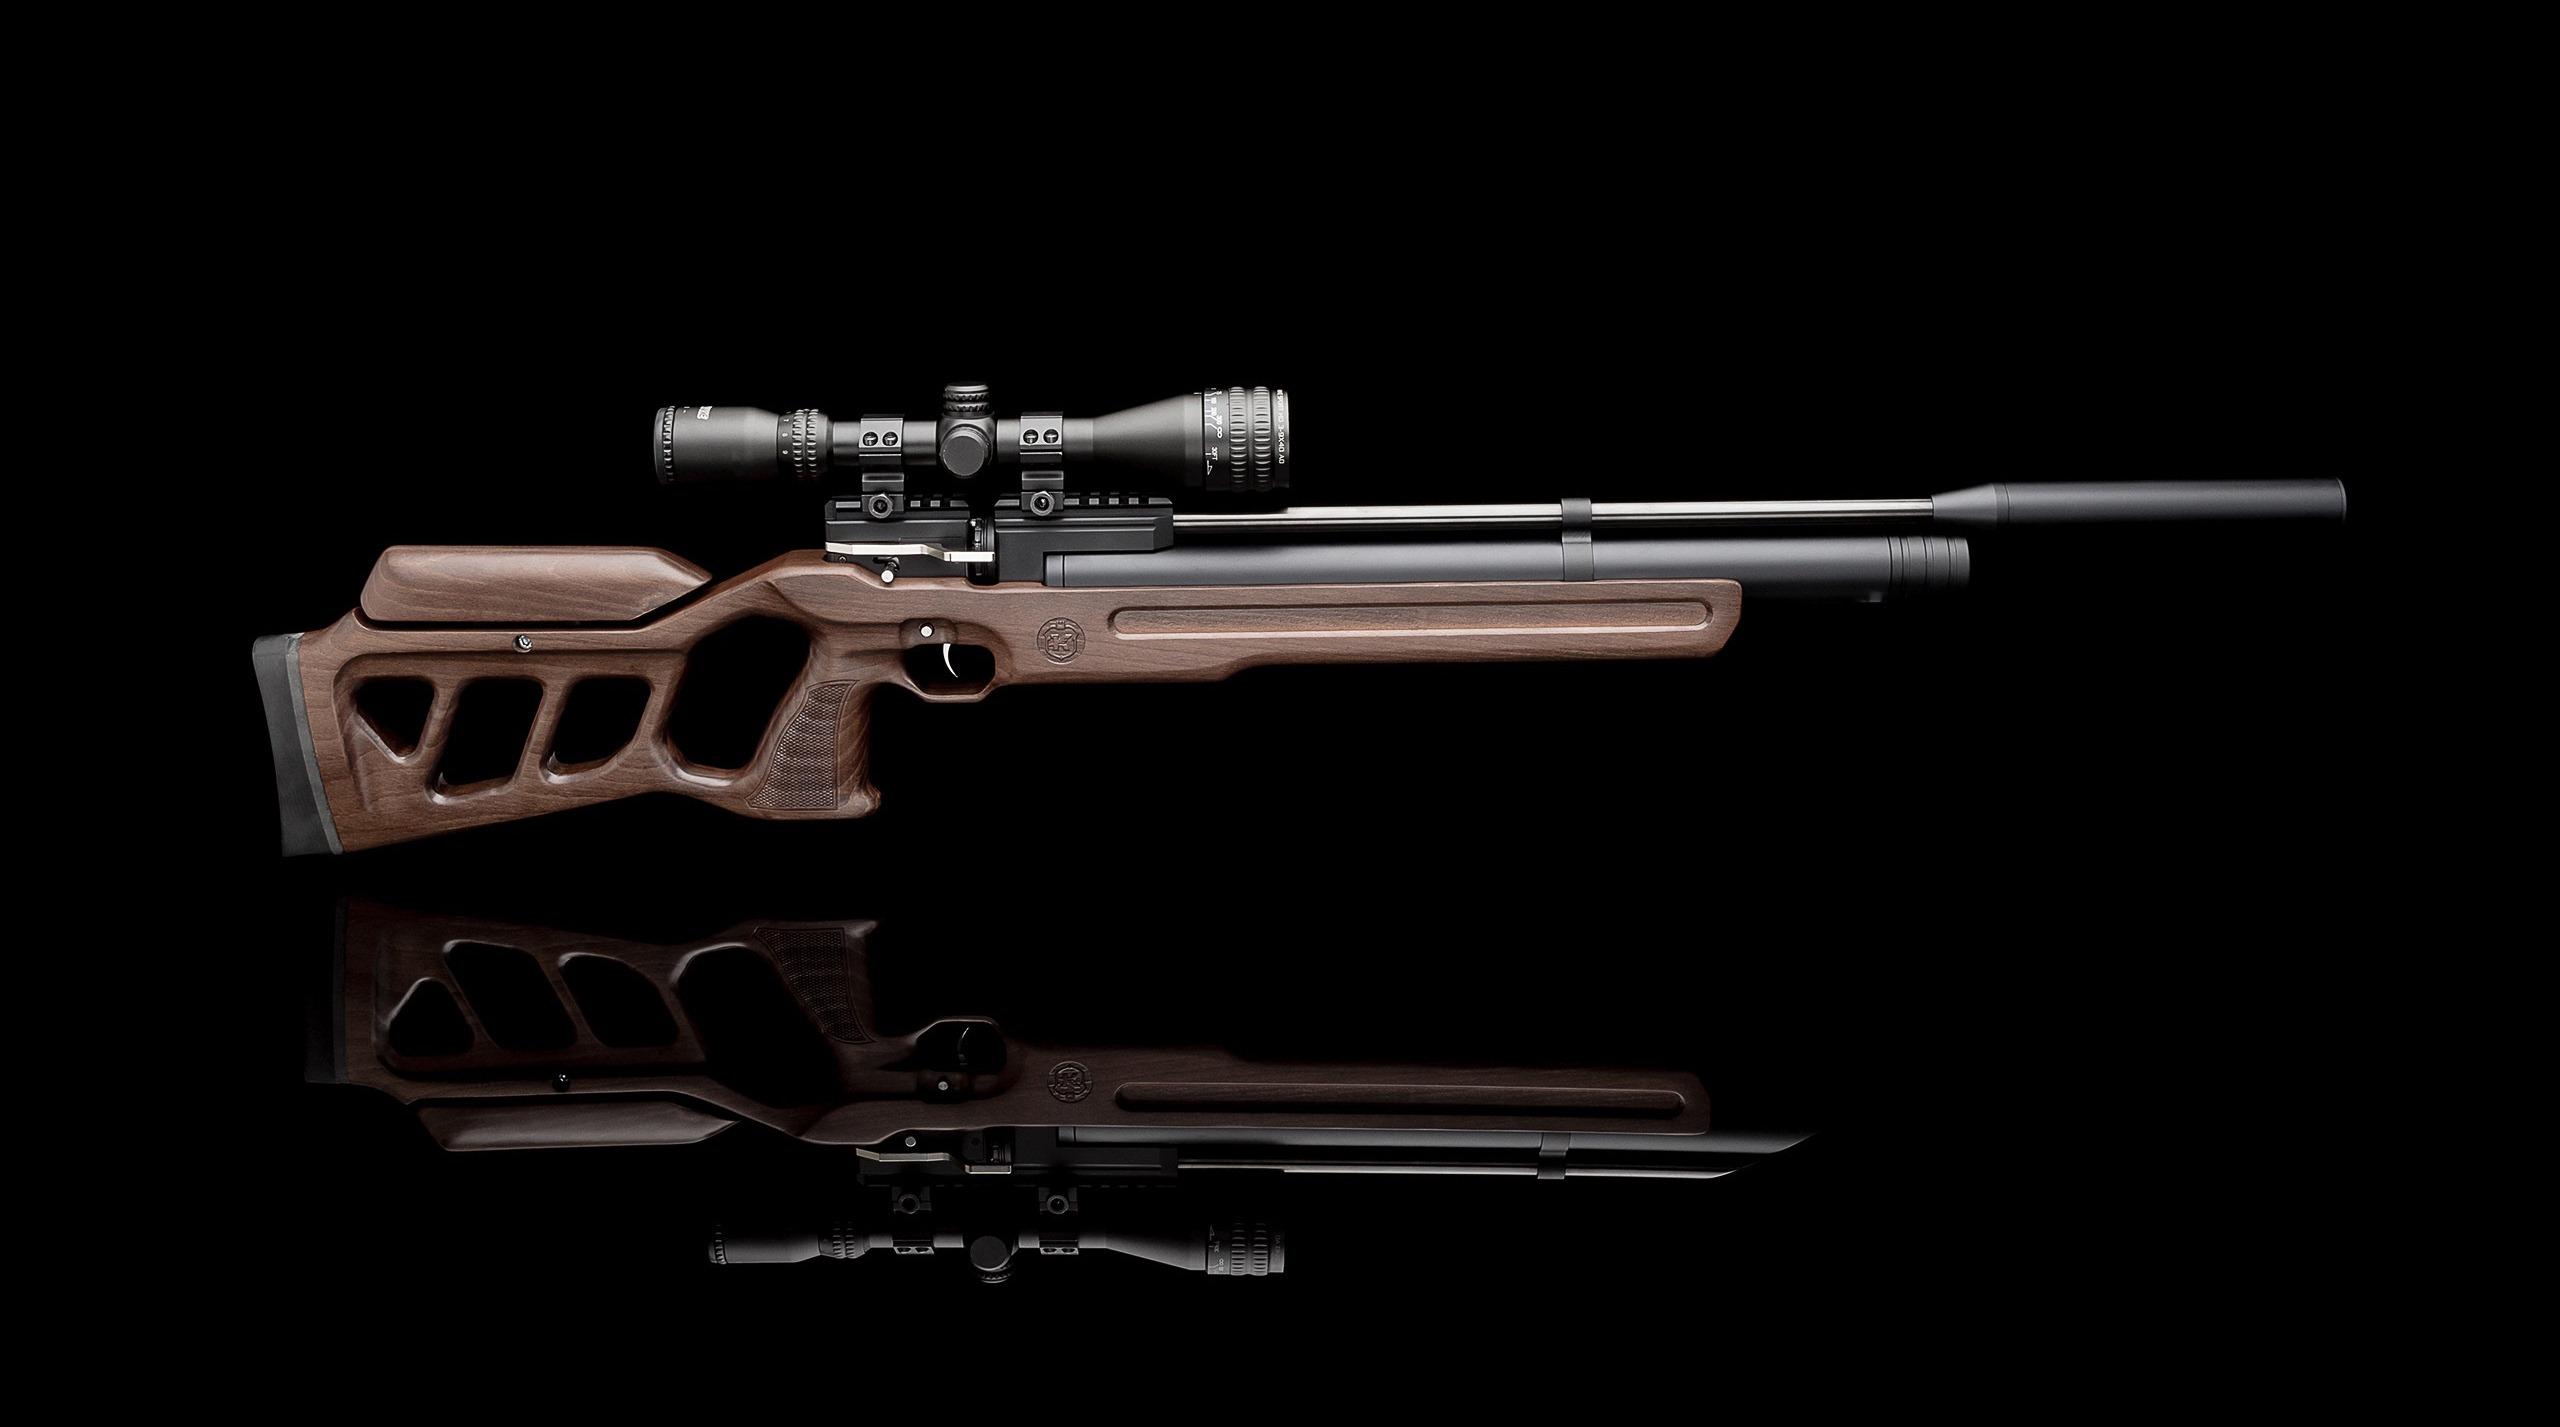 винтовка Cricket Carabine 5,5 мм